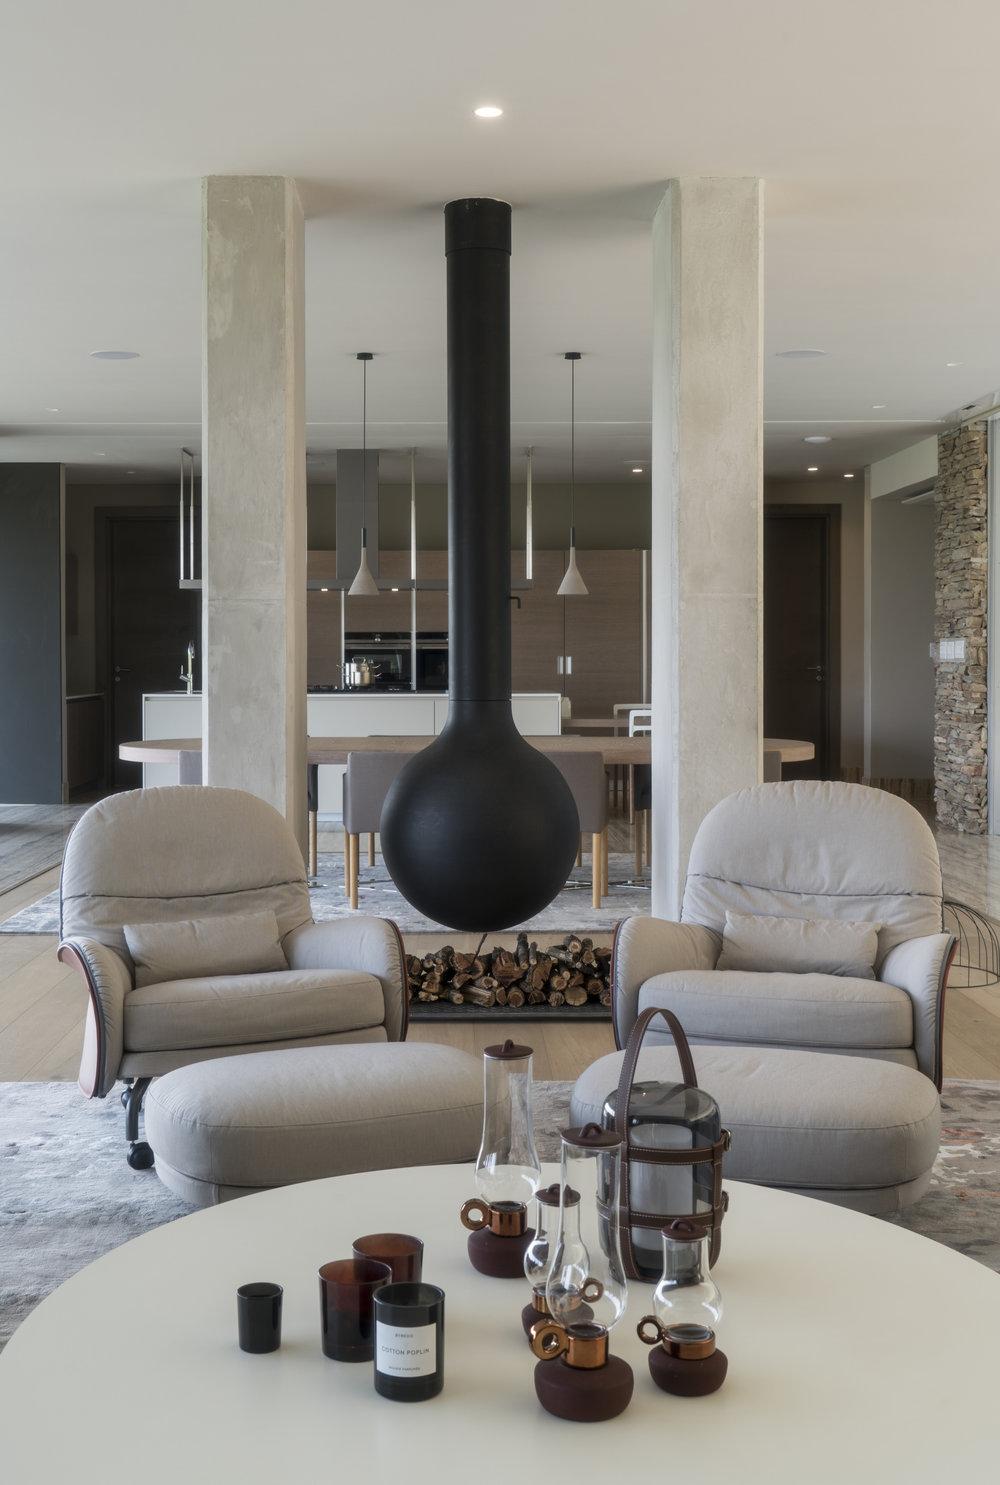 famous interior designers interior design south africa johannesburg _DSC9864.jpg